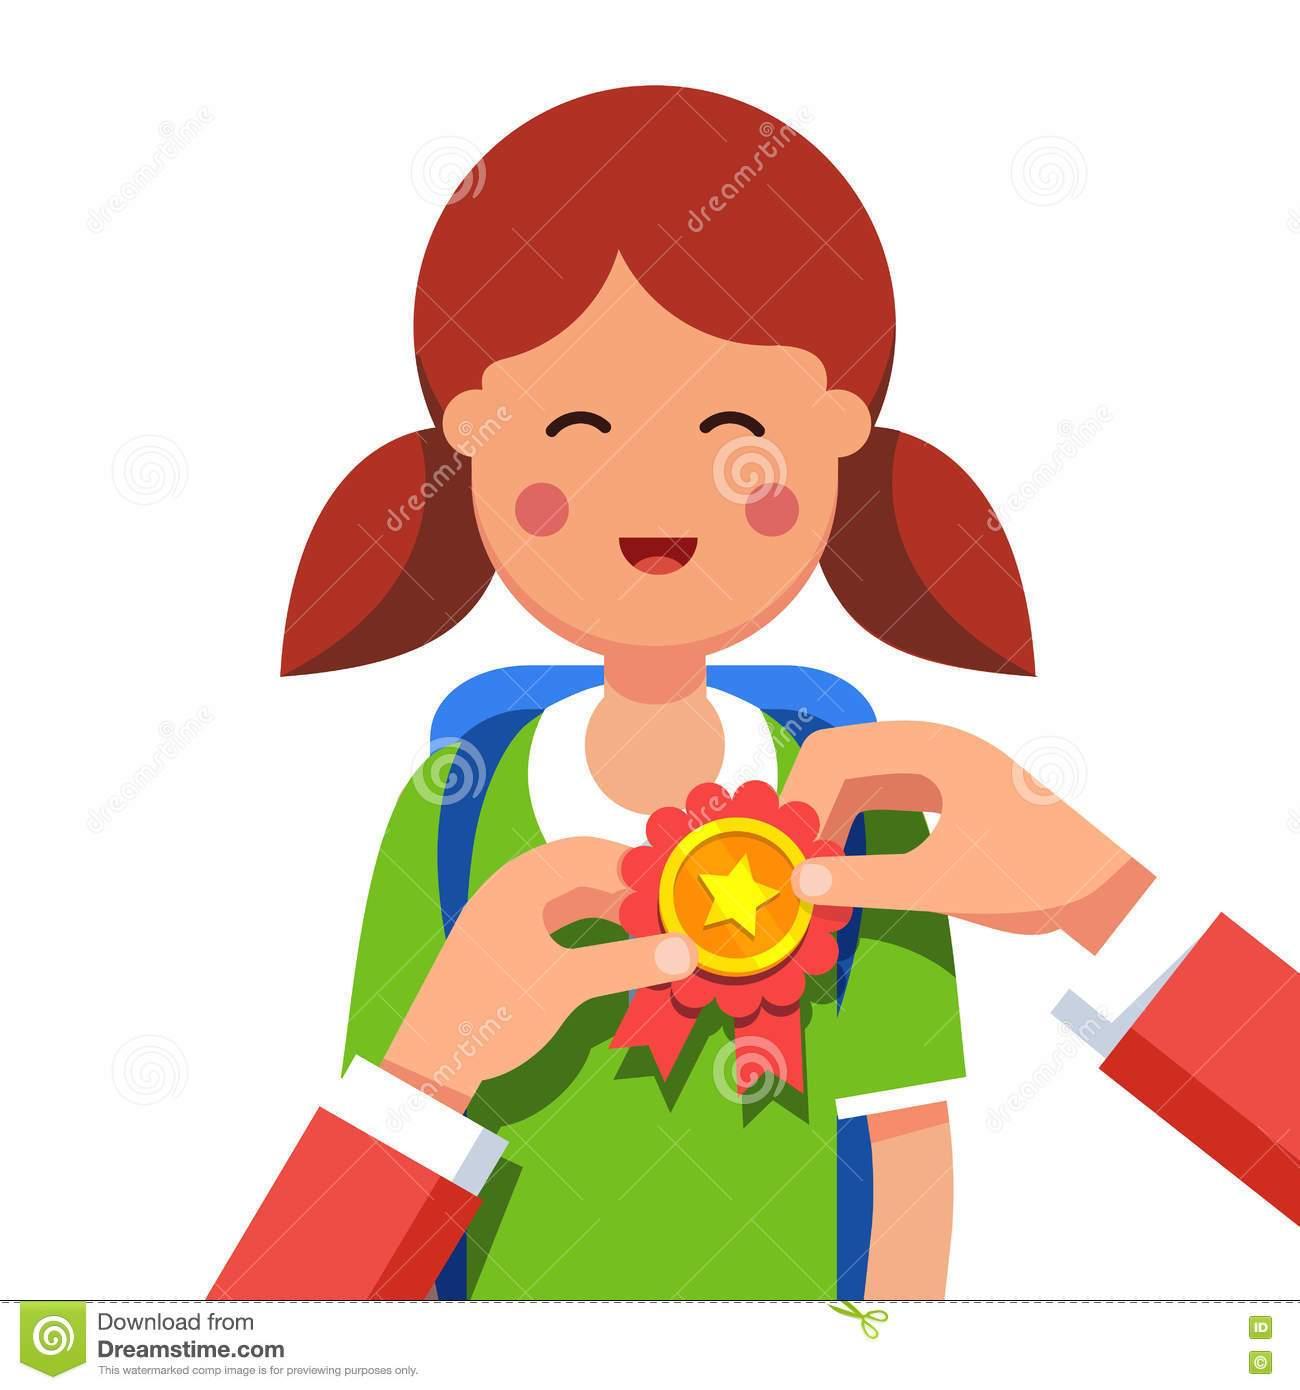 Best student award clipart 5 » Clipart Portal.